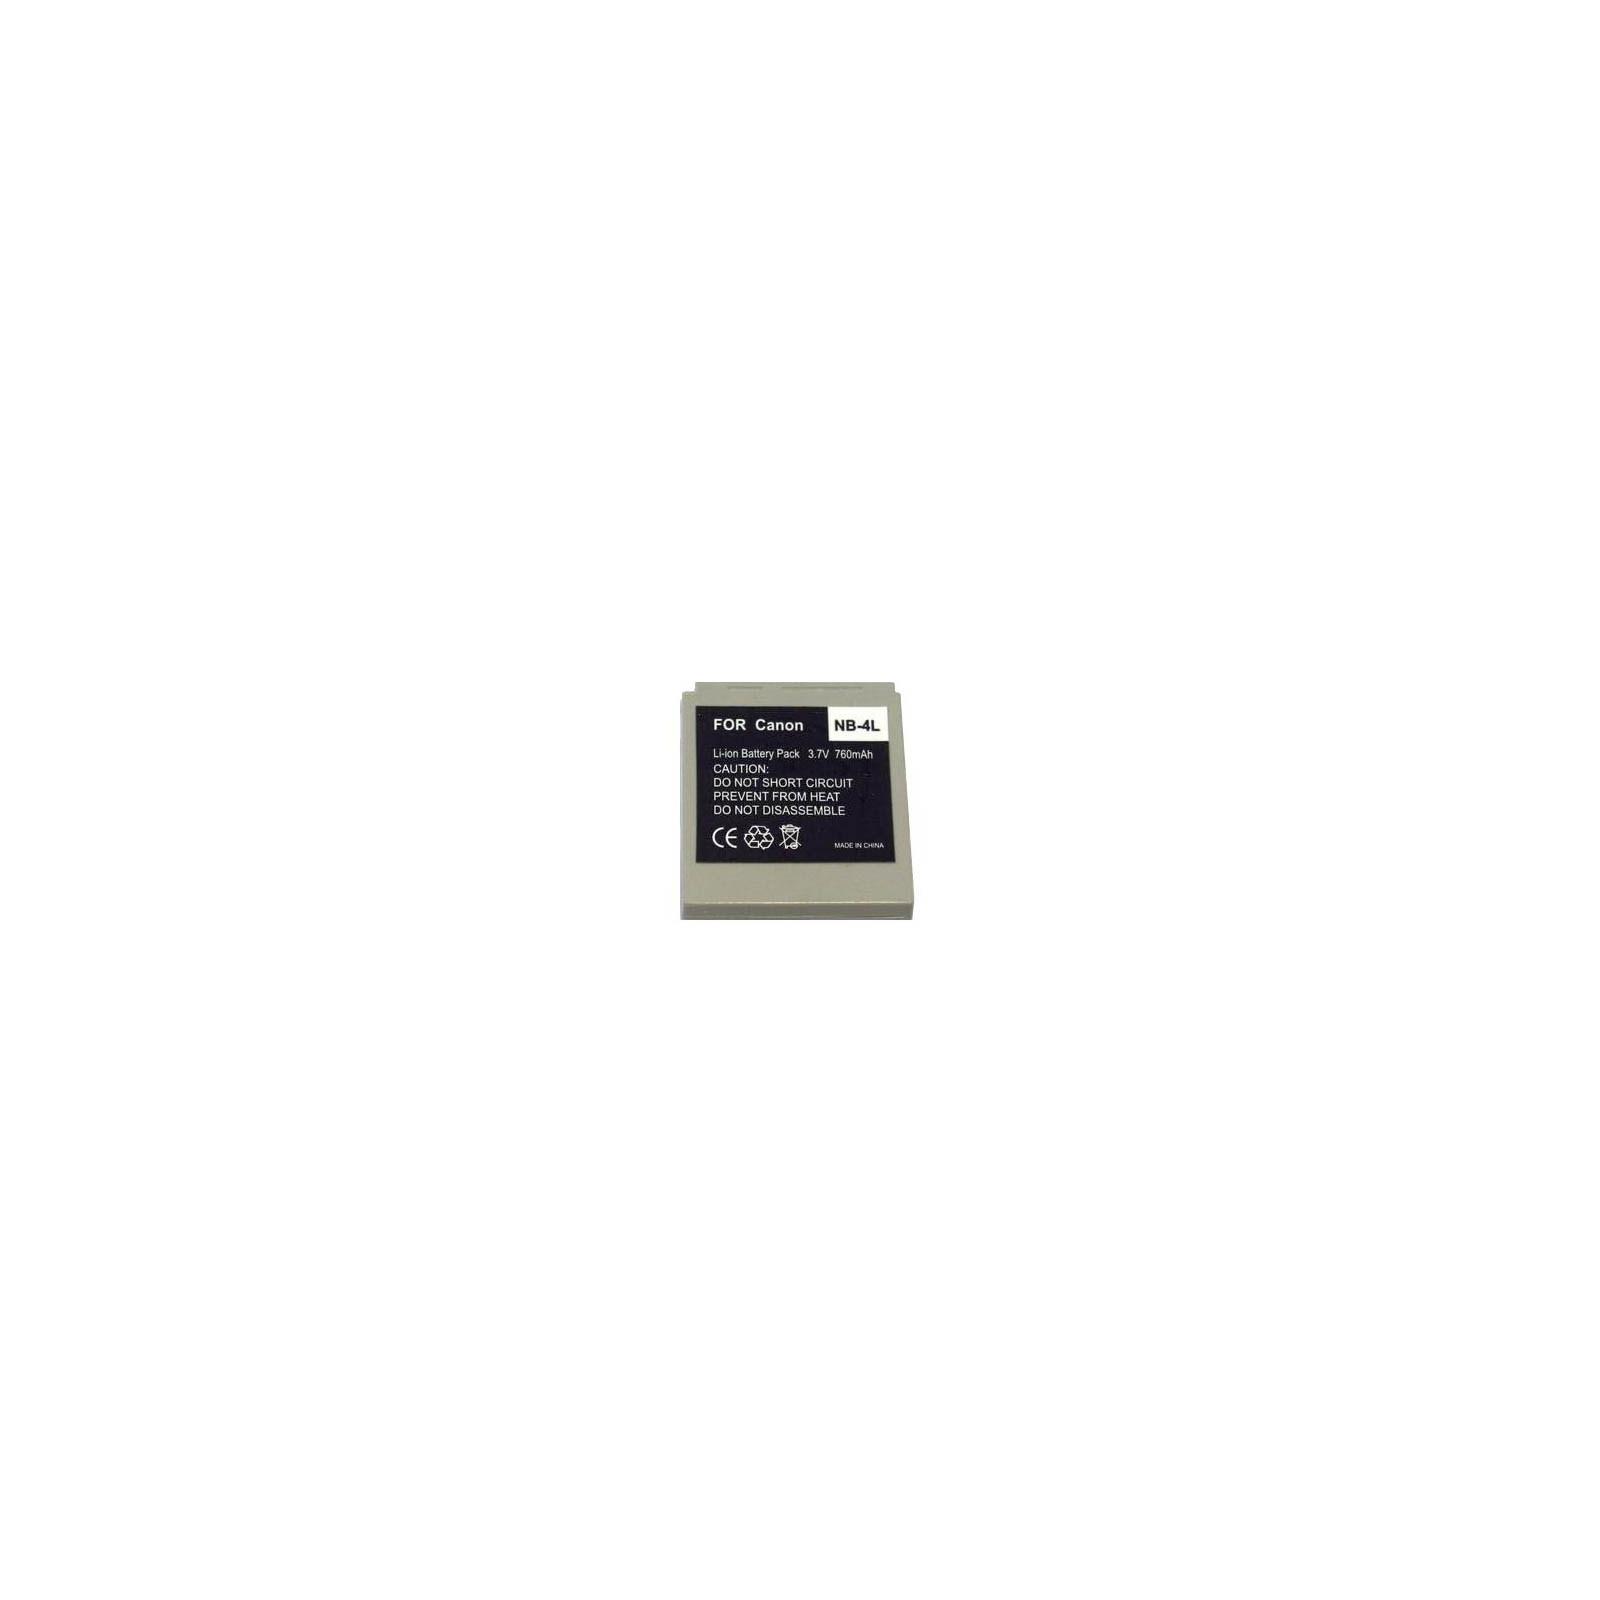 Аккумулятор к фото/видео EXTRADIGITAL Canon NB-4L (DV00DV1006)